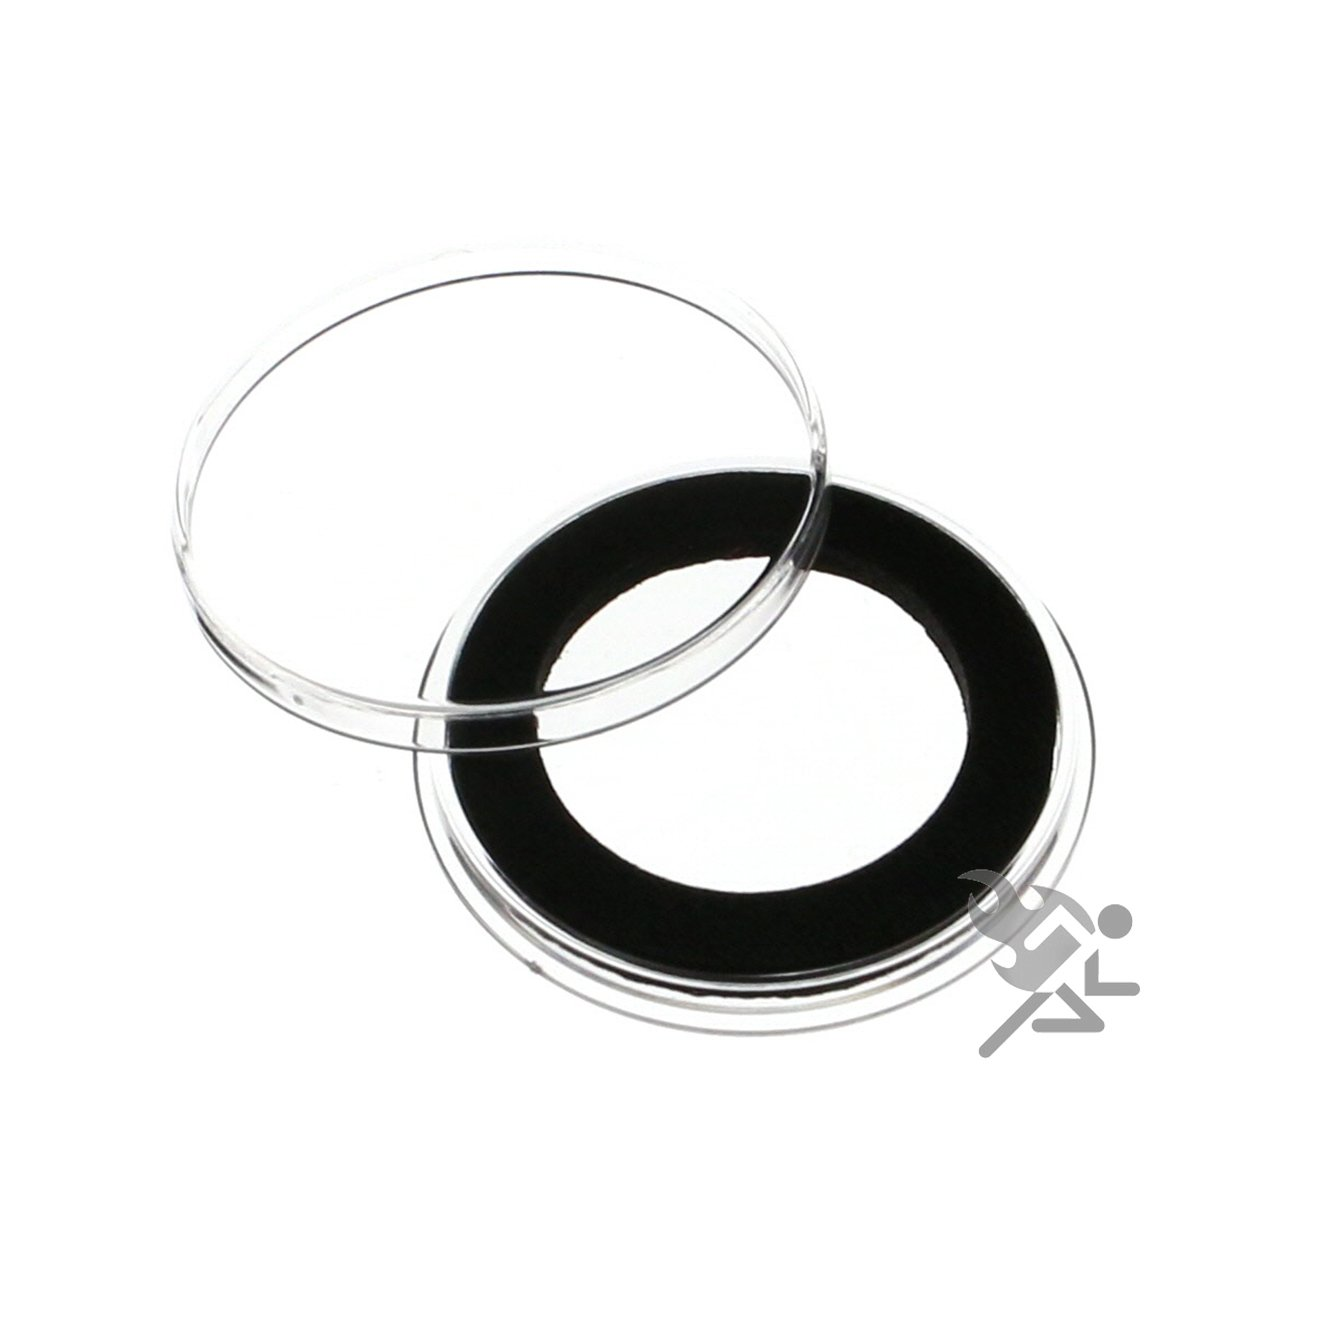 (50) Air-tite 28mm Black Ring Coin Holder Capsules for 1/2oz Gold Philharmonics